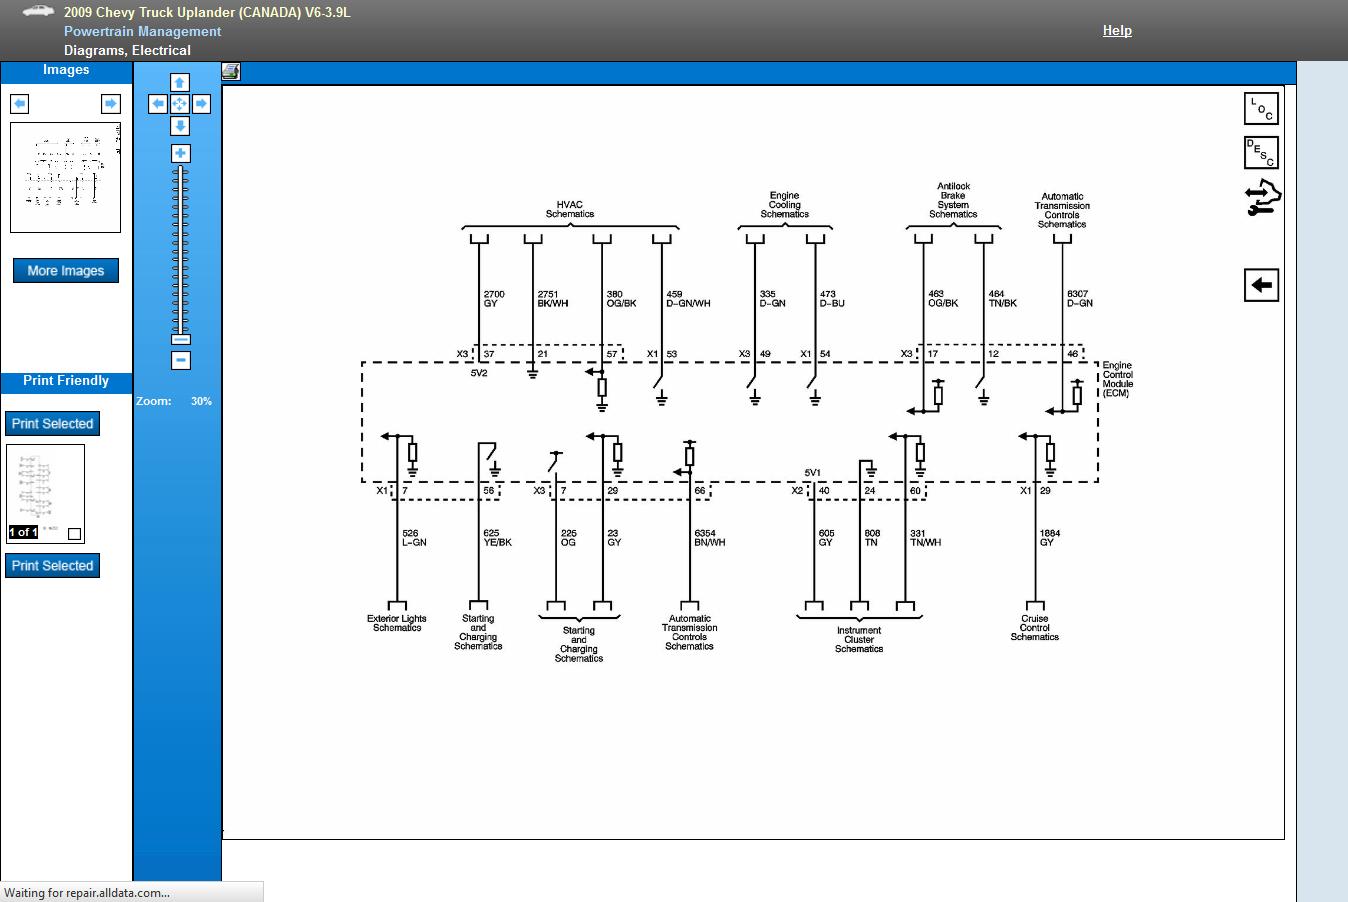 2009 chevy uplander fuse box mt 8805  2006 uplander wiring diagram download diagram  mt 8805  2006 uplander wiring diagram